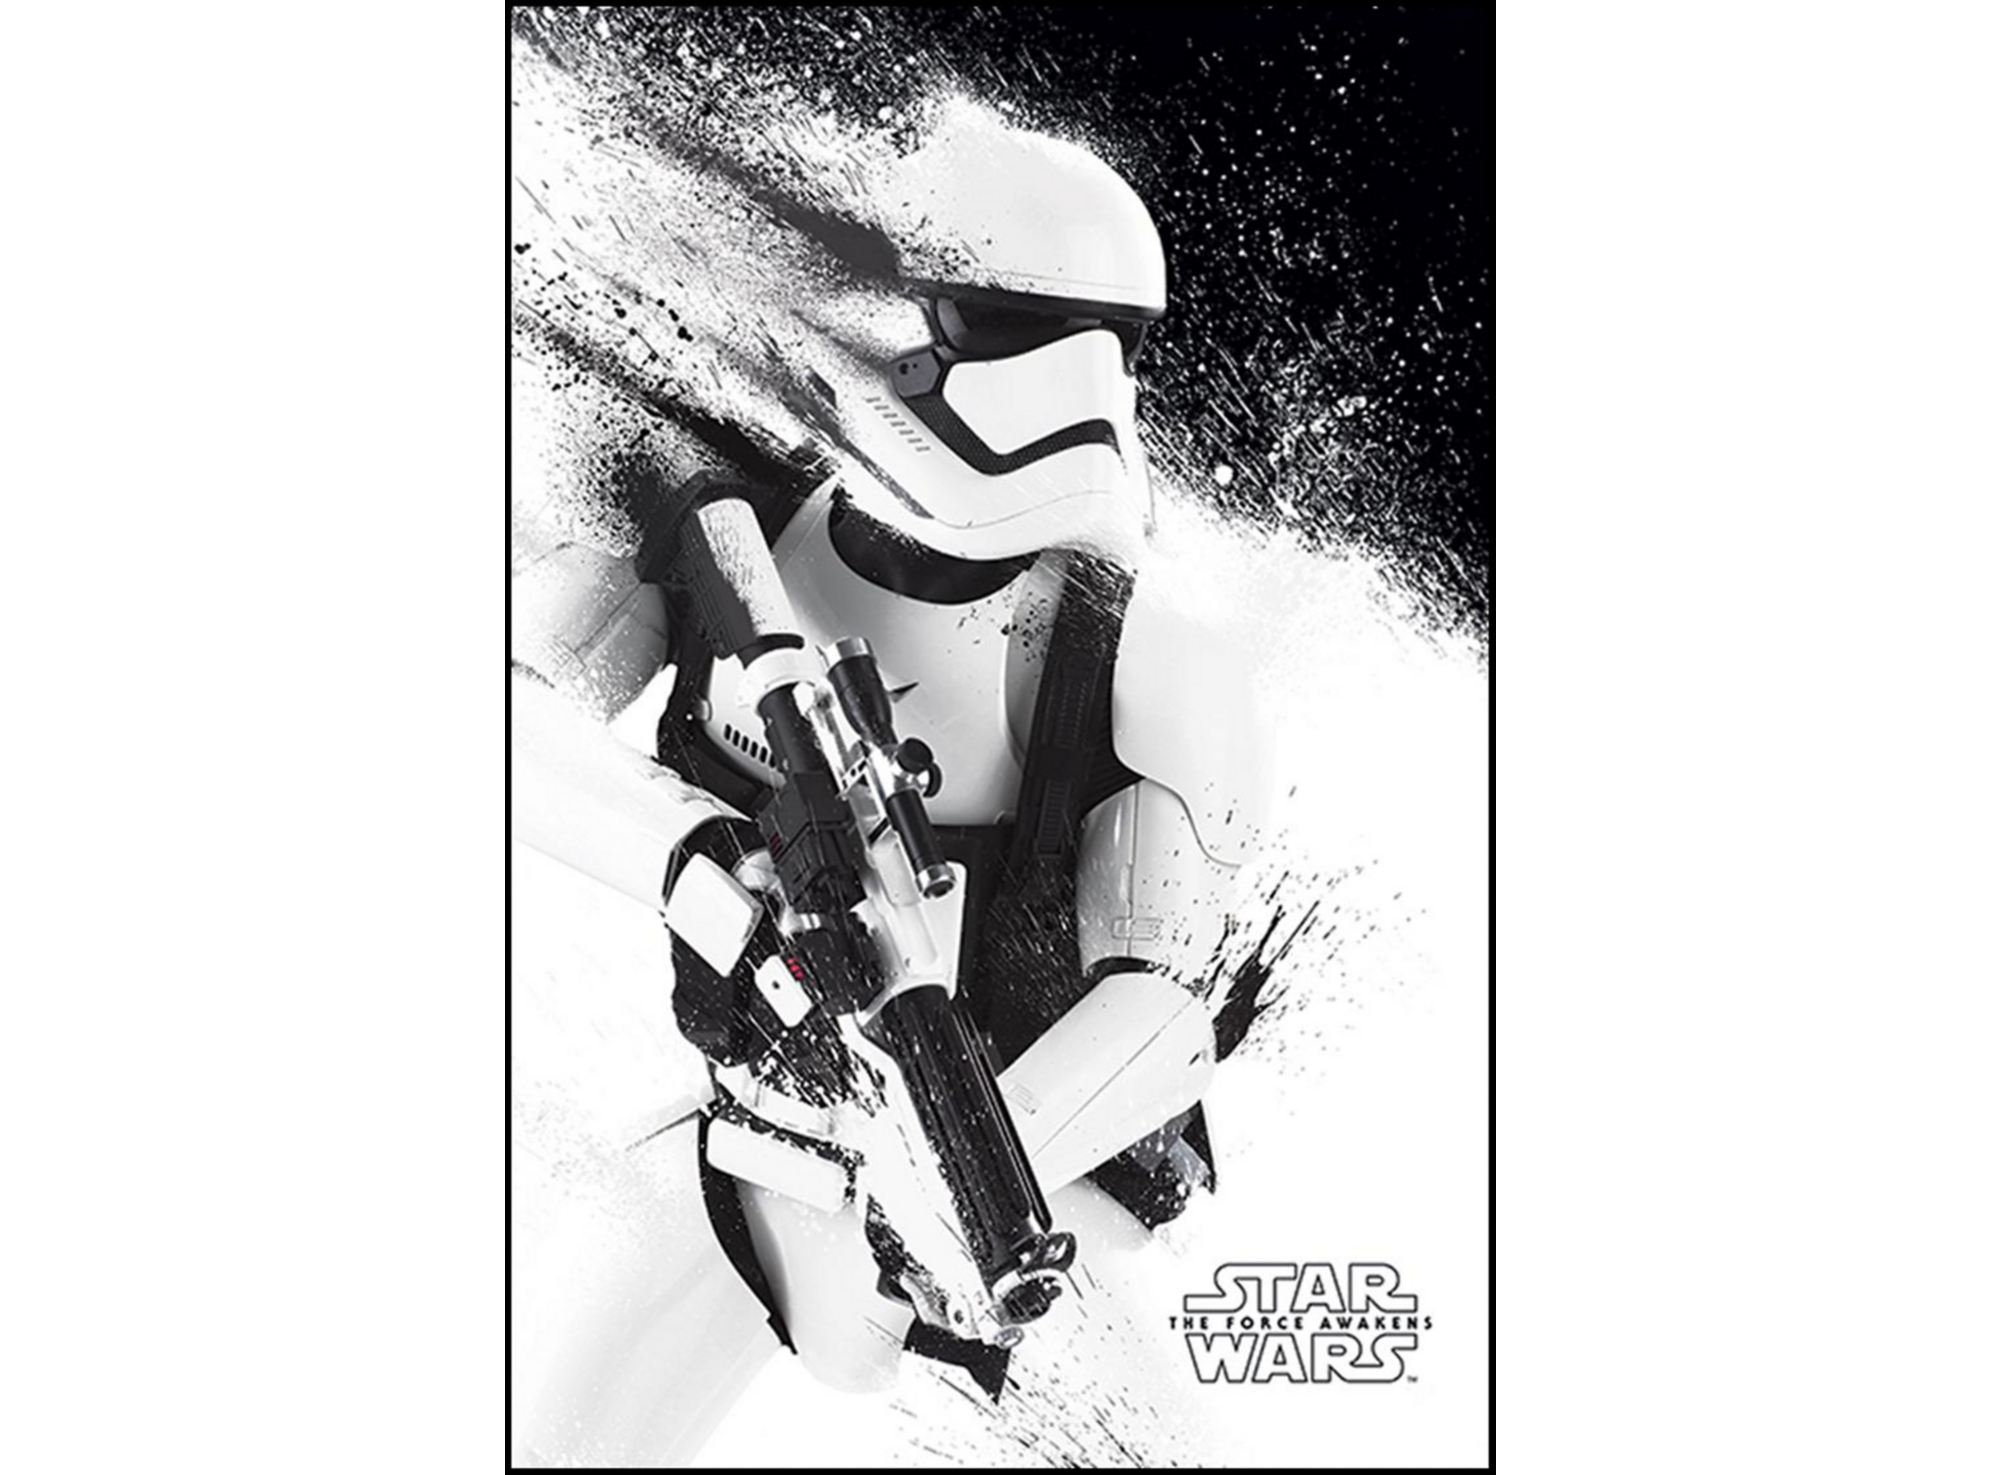 Affiche Encadree Star Wars Episode 7 61x91 5cm Fly